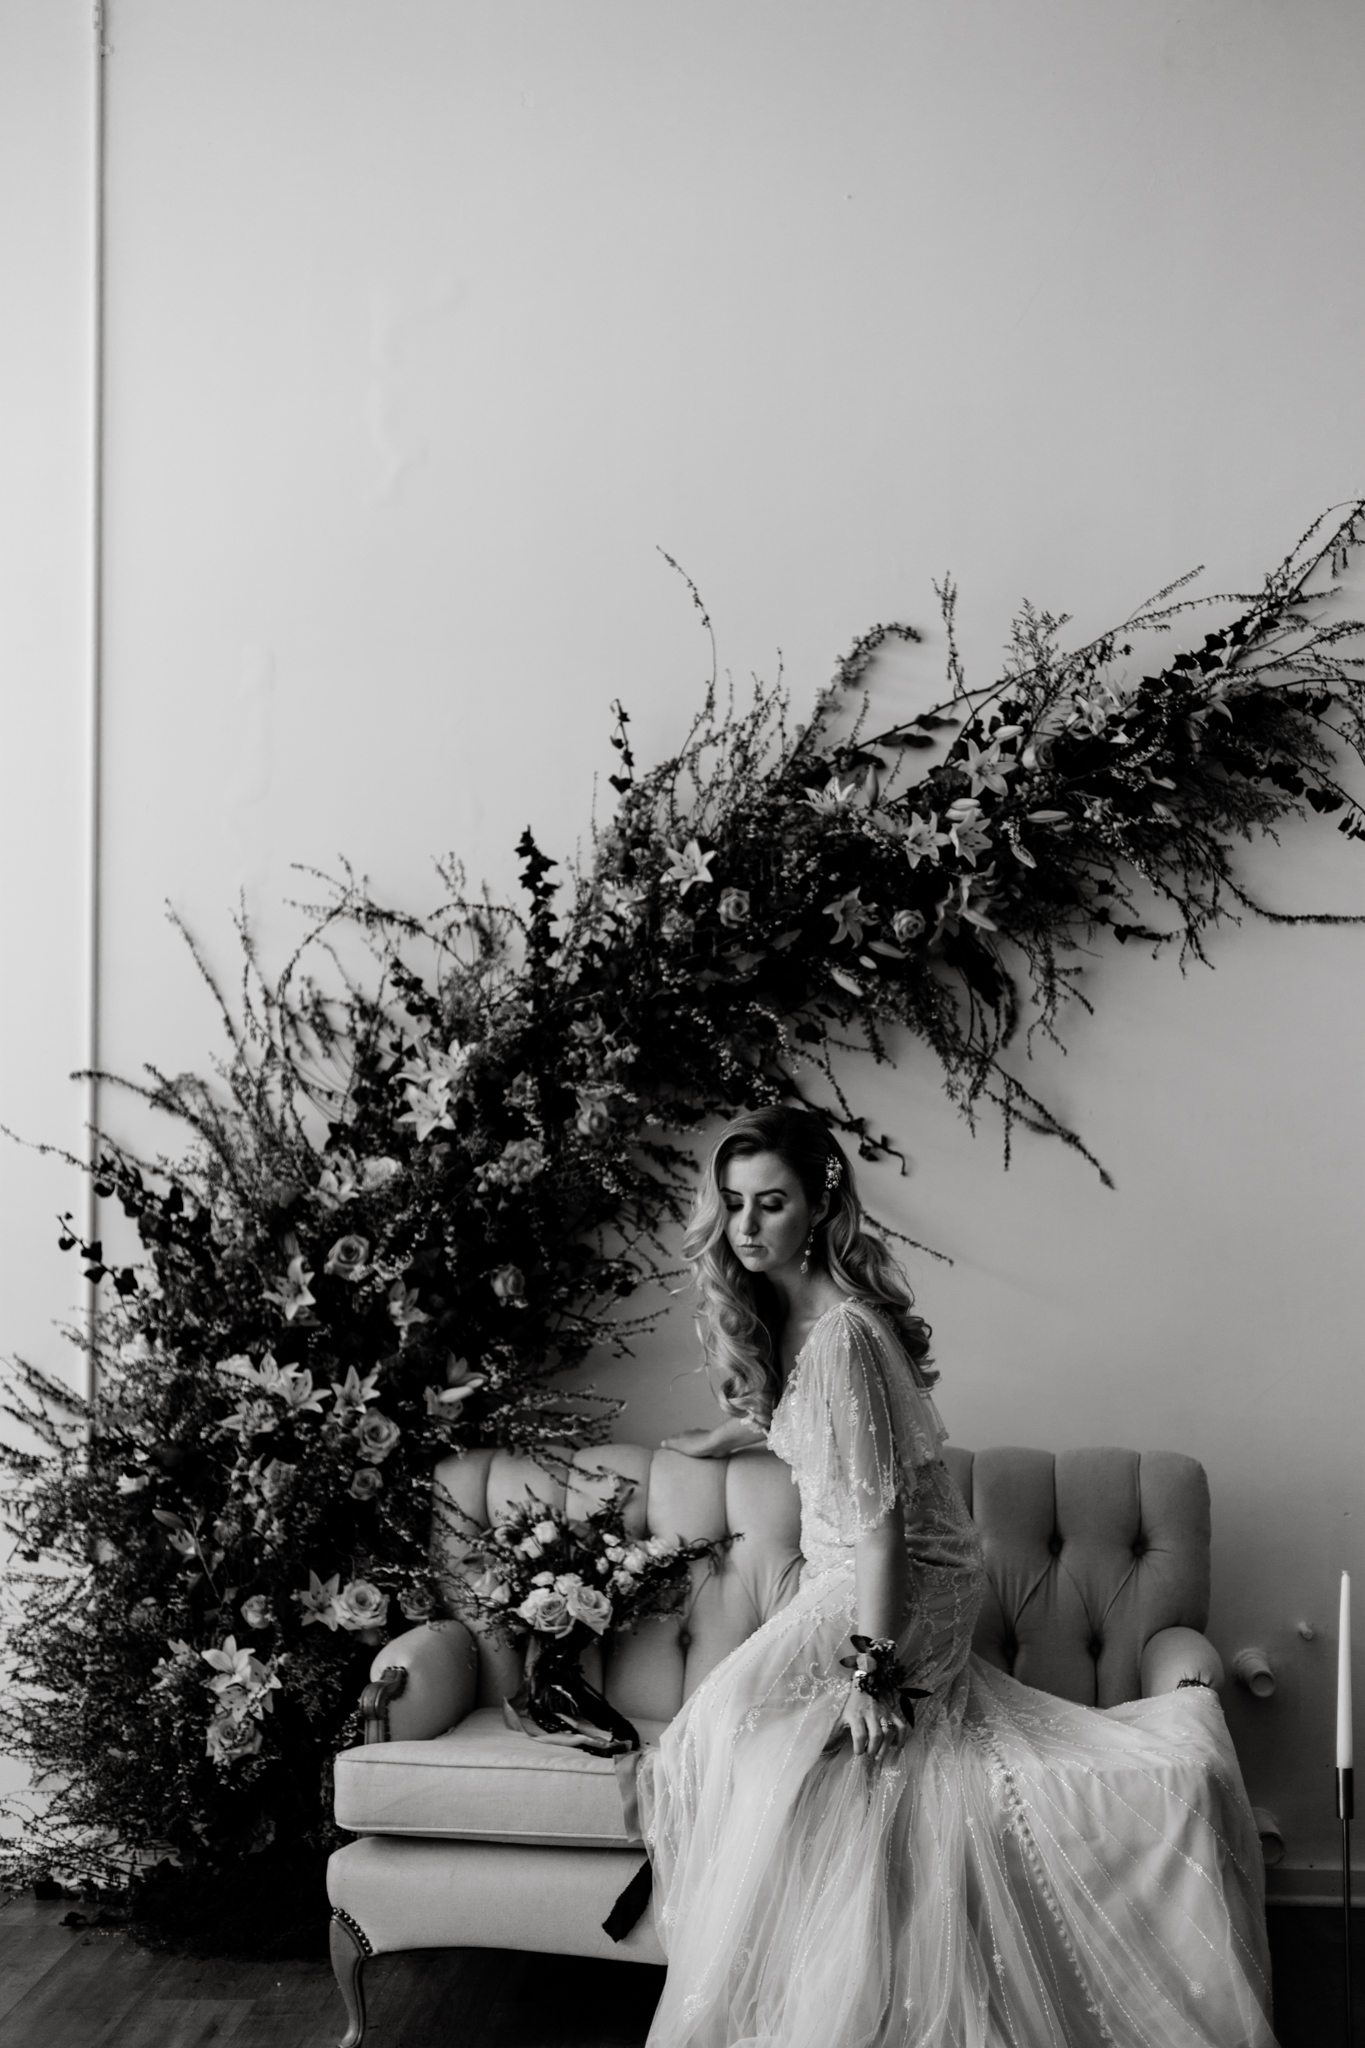 Lightroom PDX - Portland OR - Malina Rose Photography-1.jpg